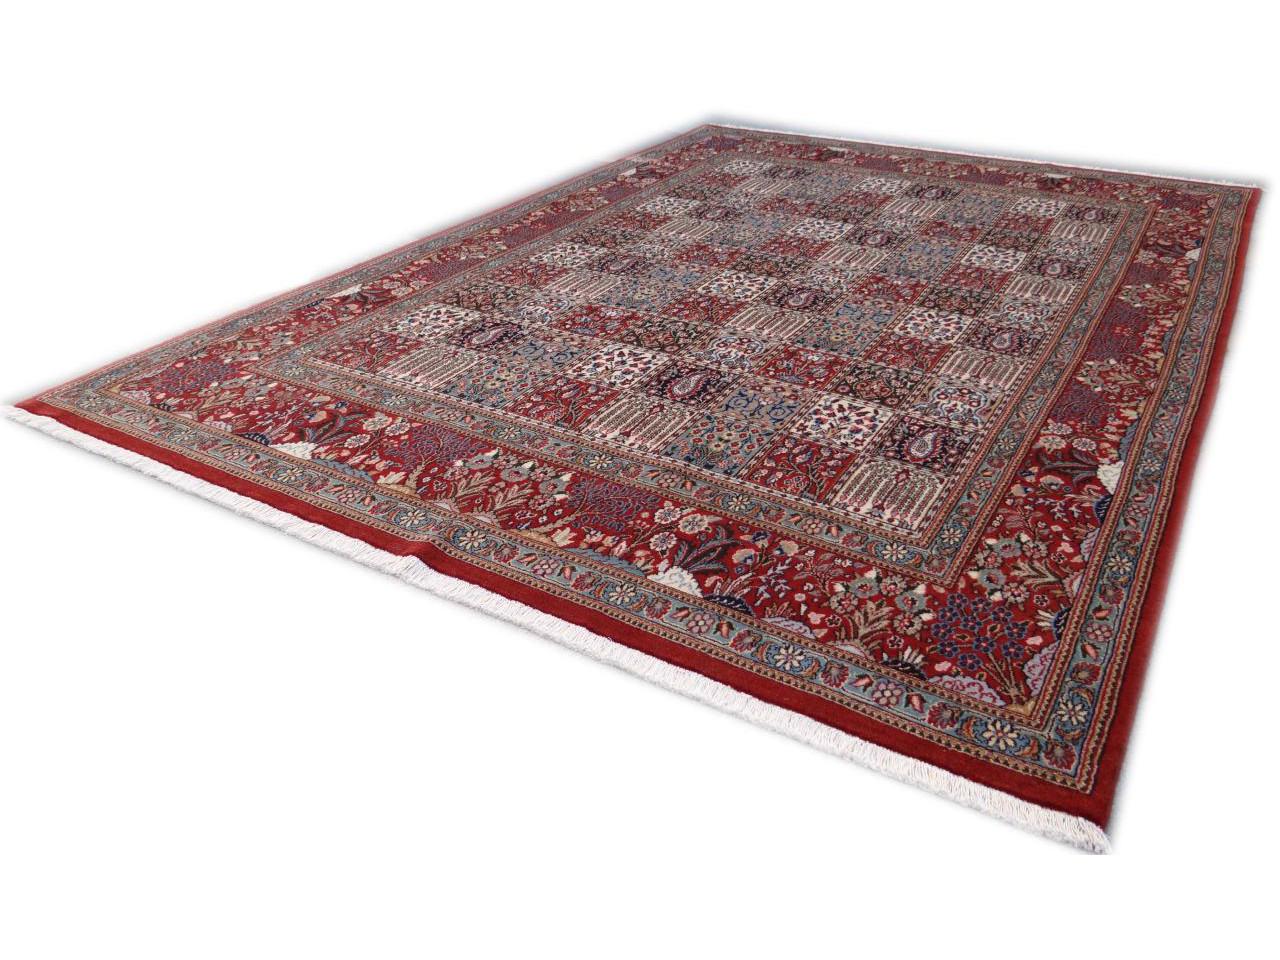 moud jardin tapis persans n 2487 301x213cm. Black Bedroom Furniture Sets. Home Design Ideas